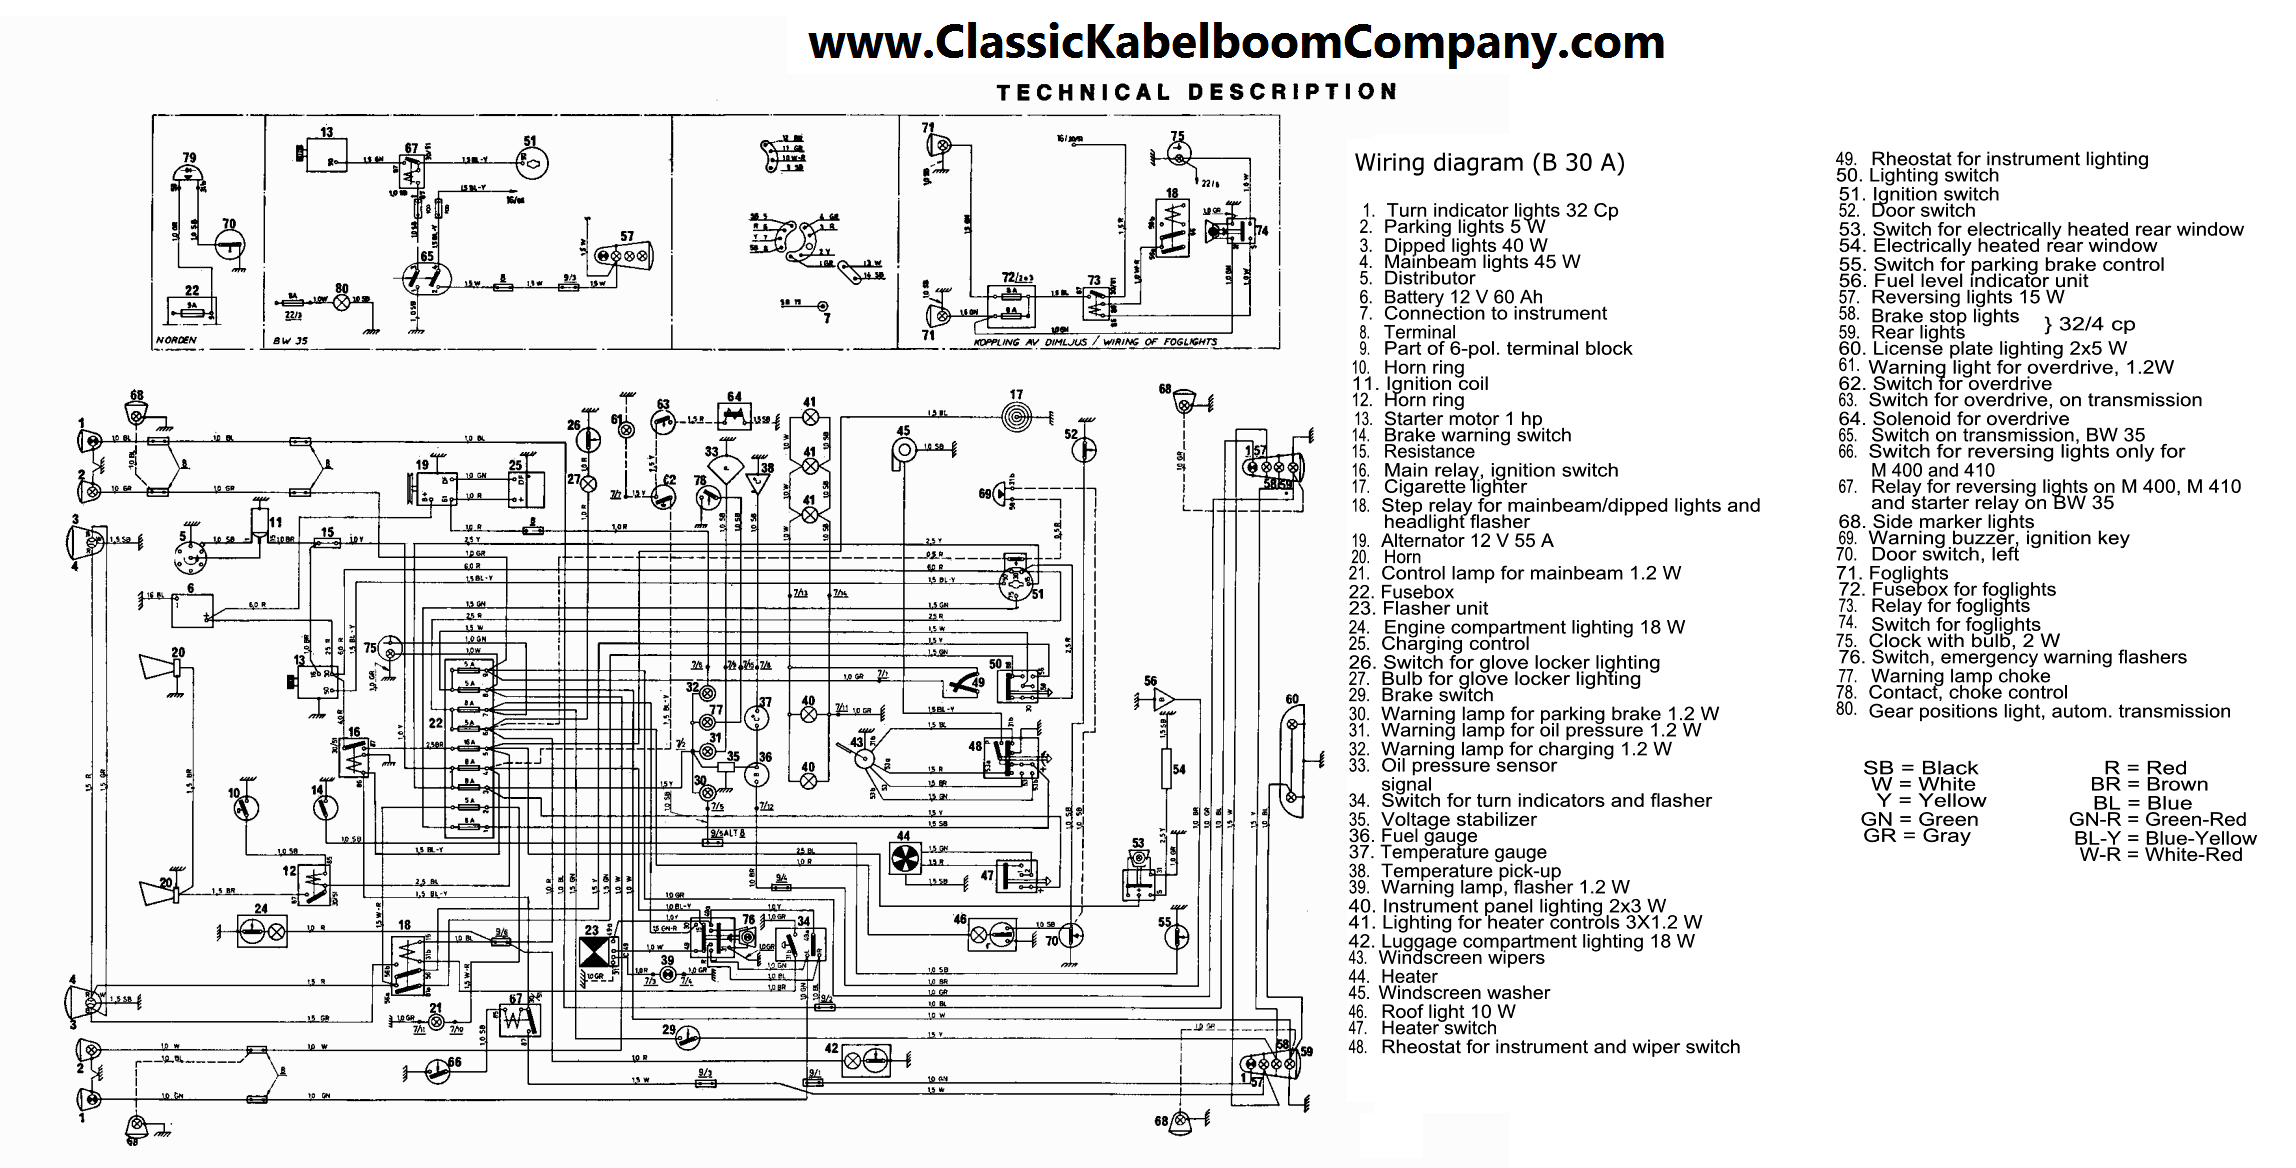 Volvo 164 Wiring Diagram Volvo VNL Truck Wiring Diagrams - Wiring ...